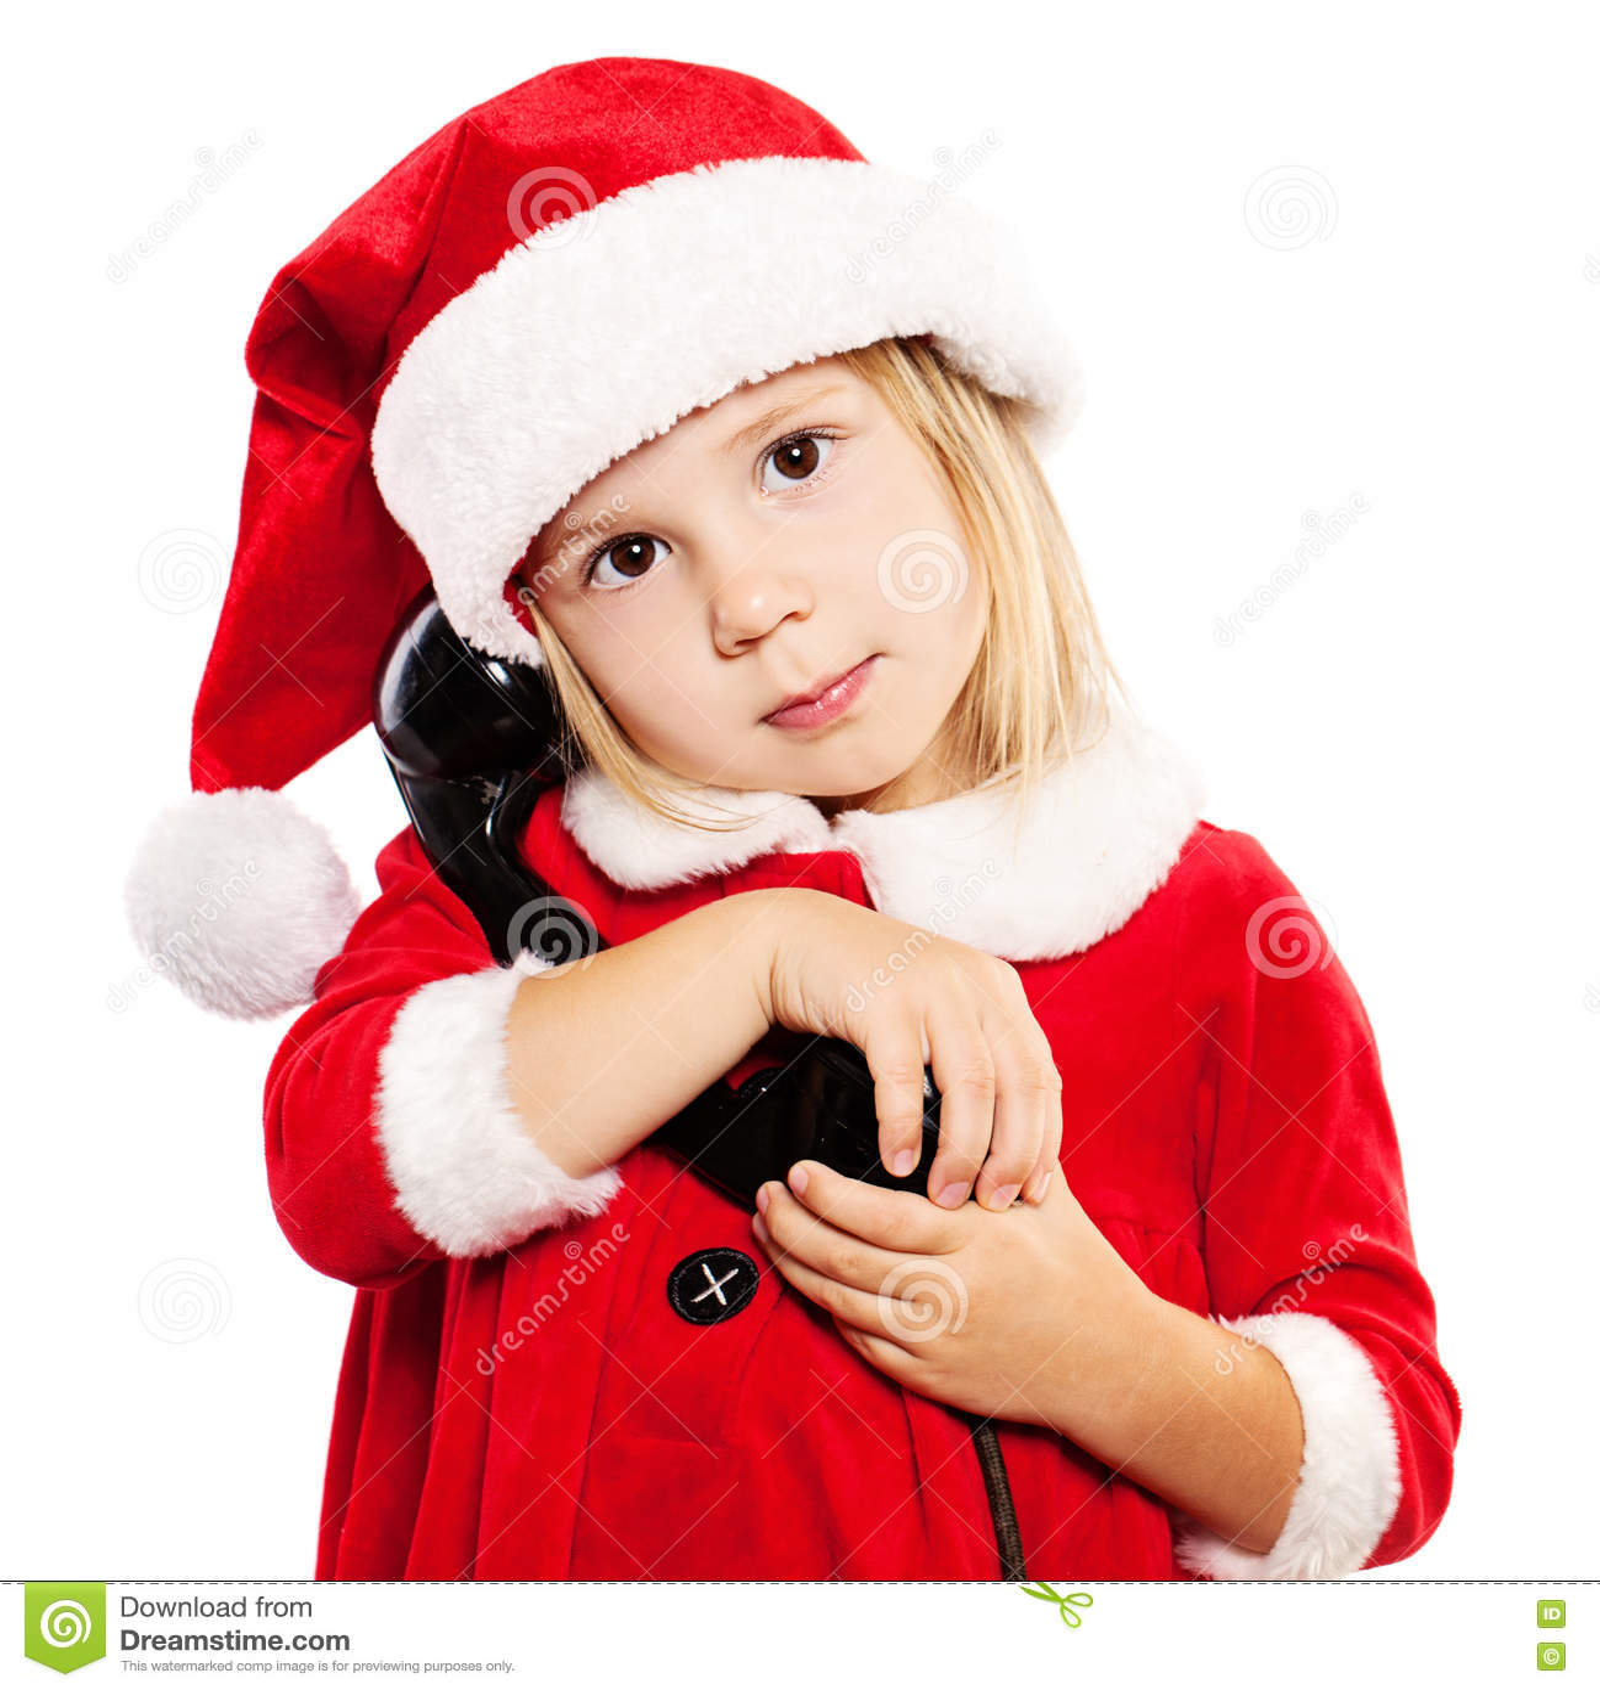 edffbfc4f Child In Santa Hat. Christmas Child Stock Photo - Image of cute ...